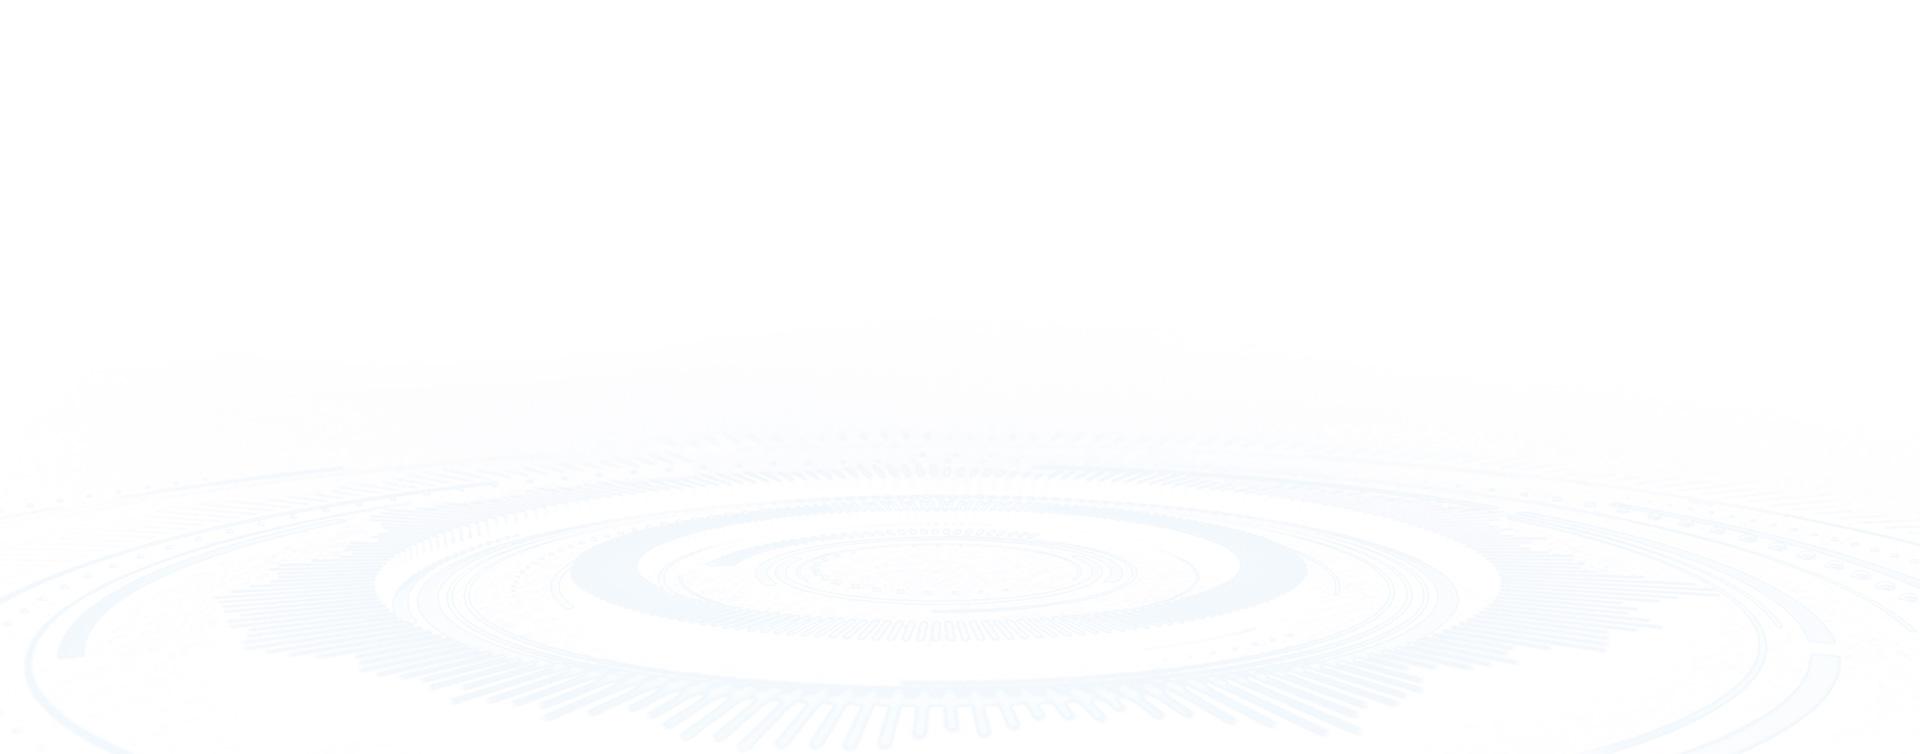 Efficient Solutions for Complex Electrode Design